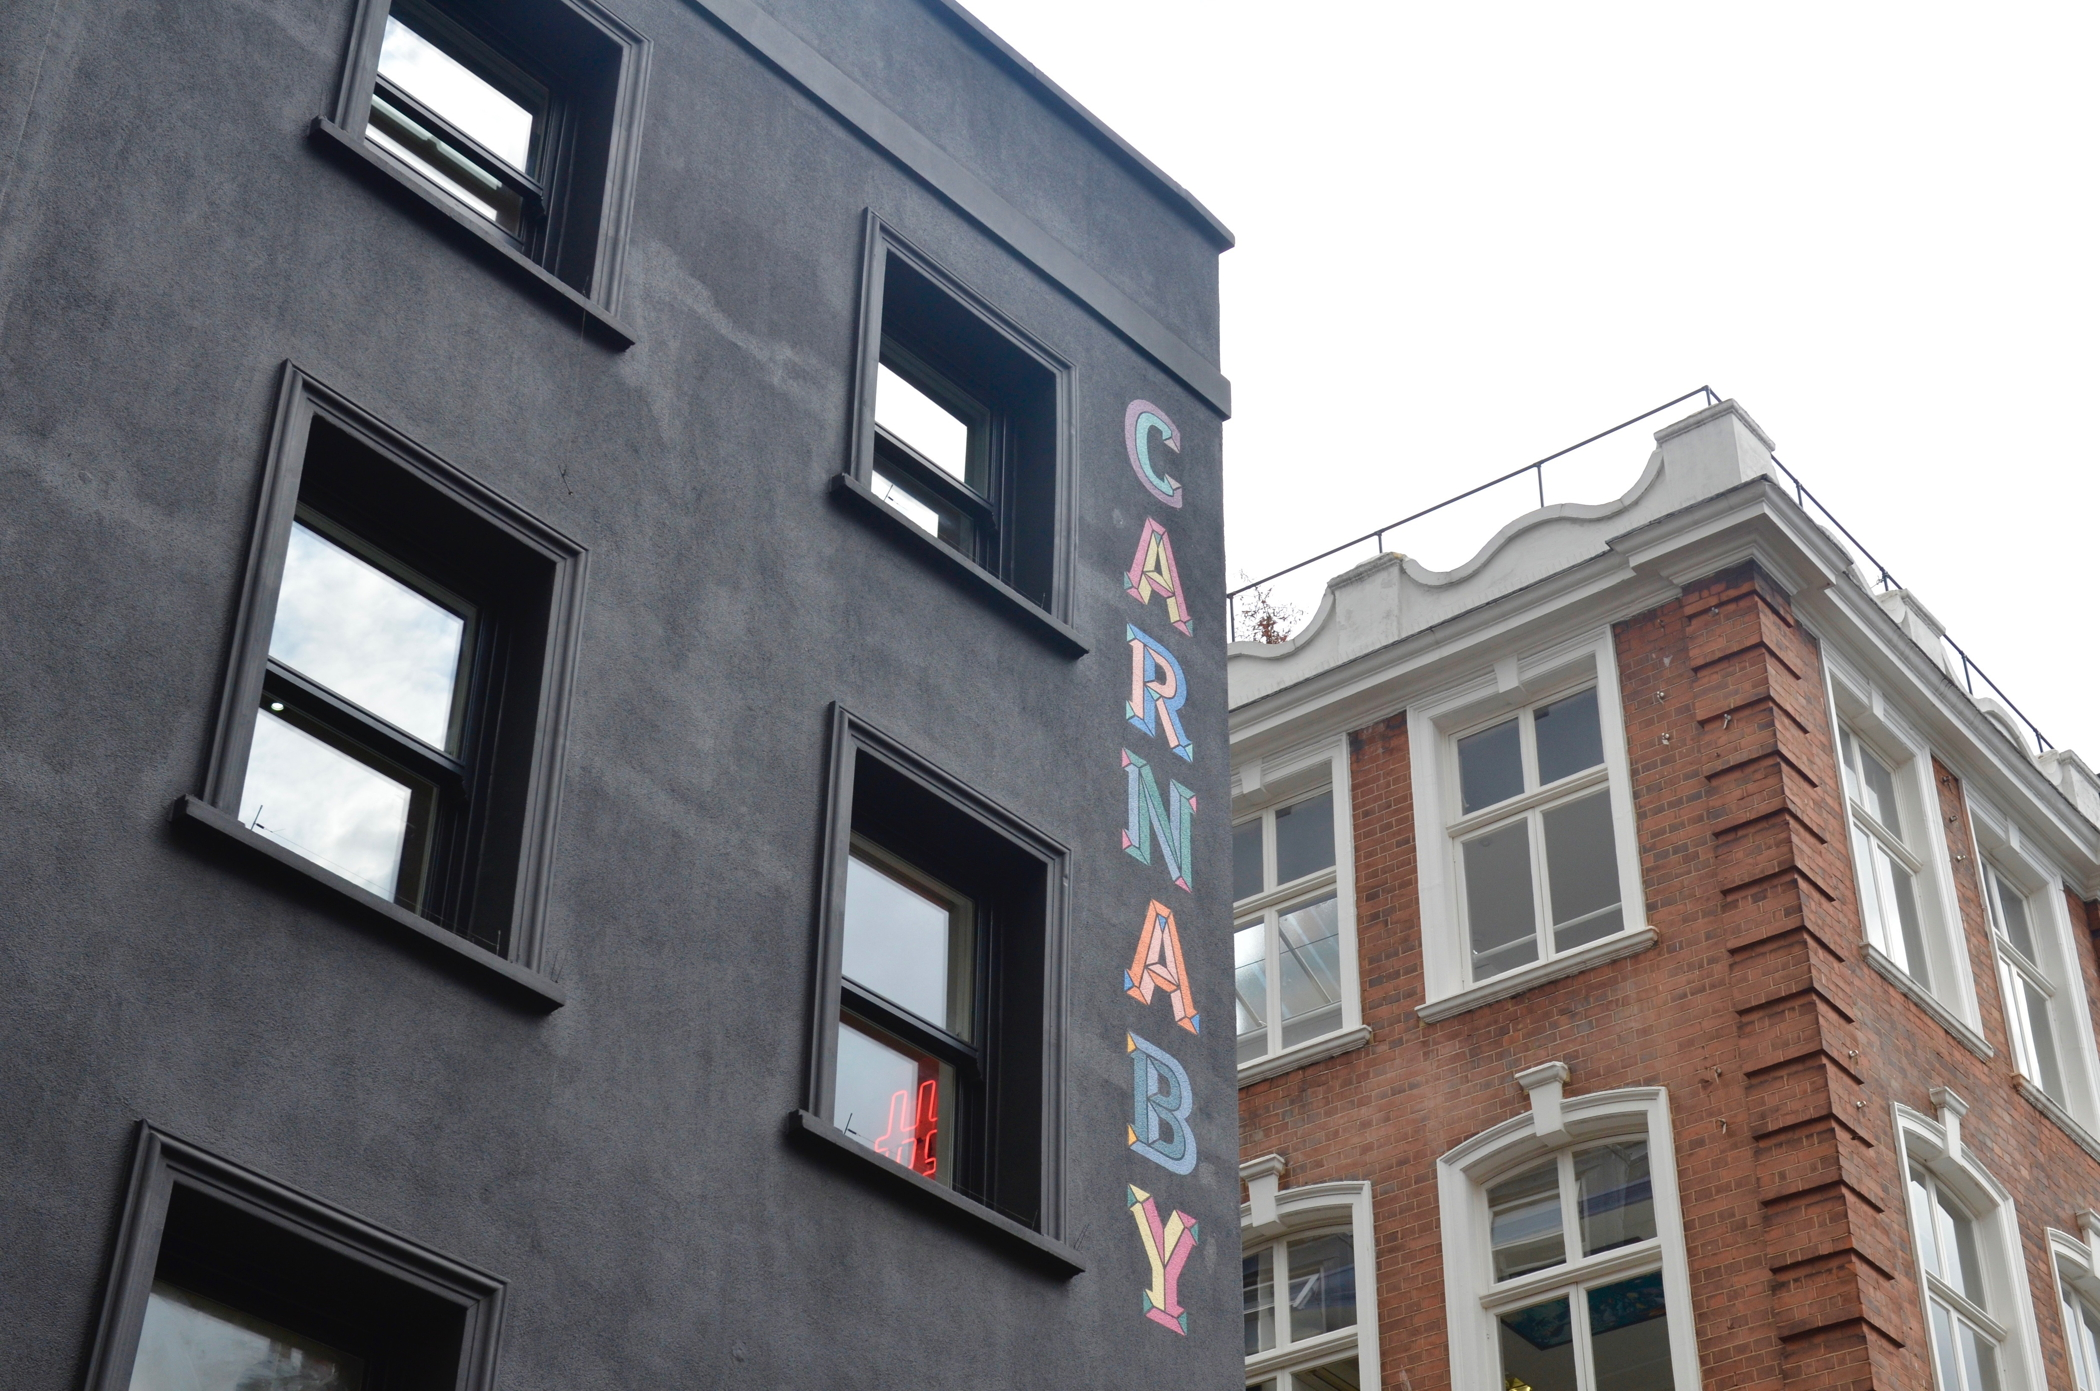 Die Carnaby Street im Swinging London von Soho